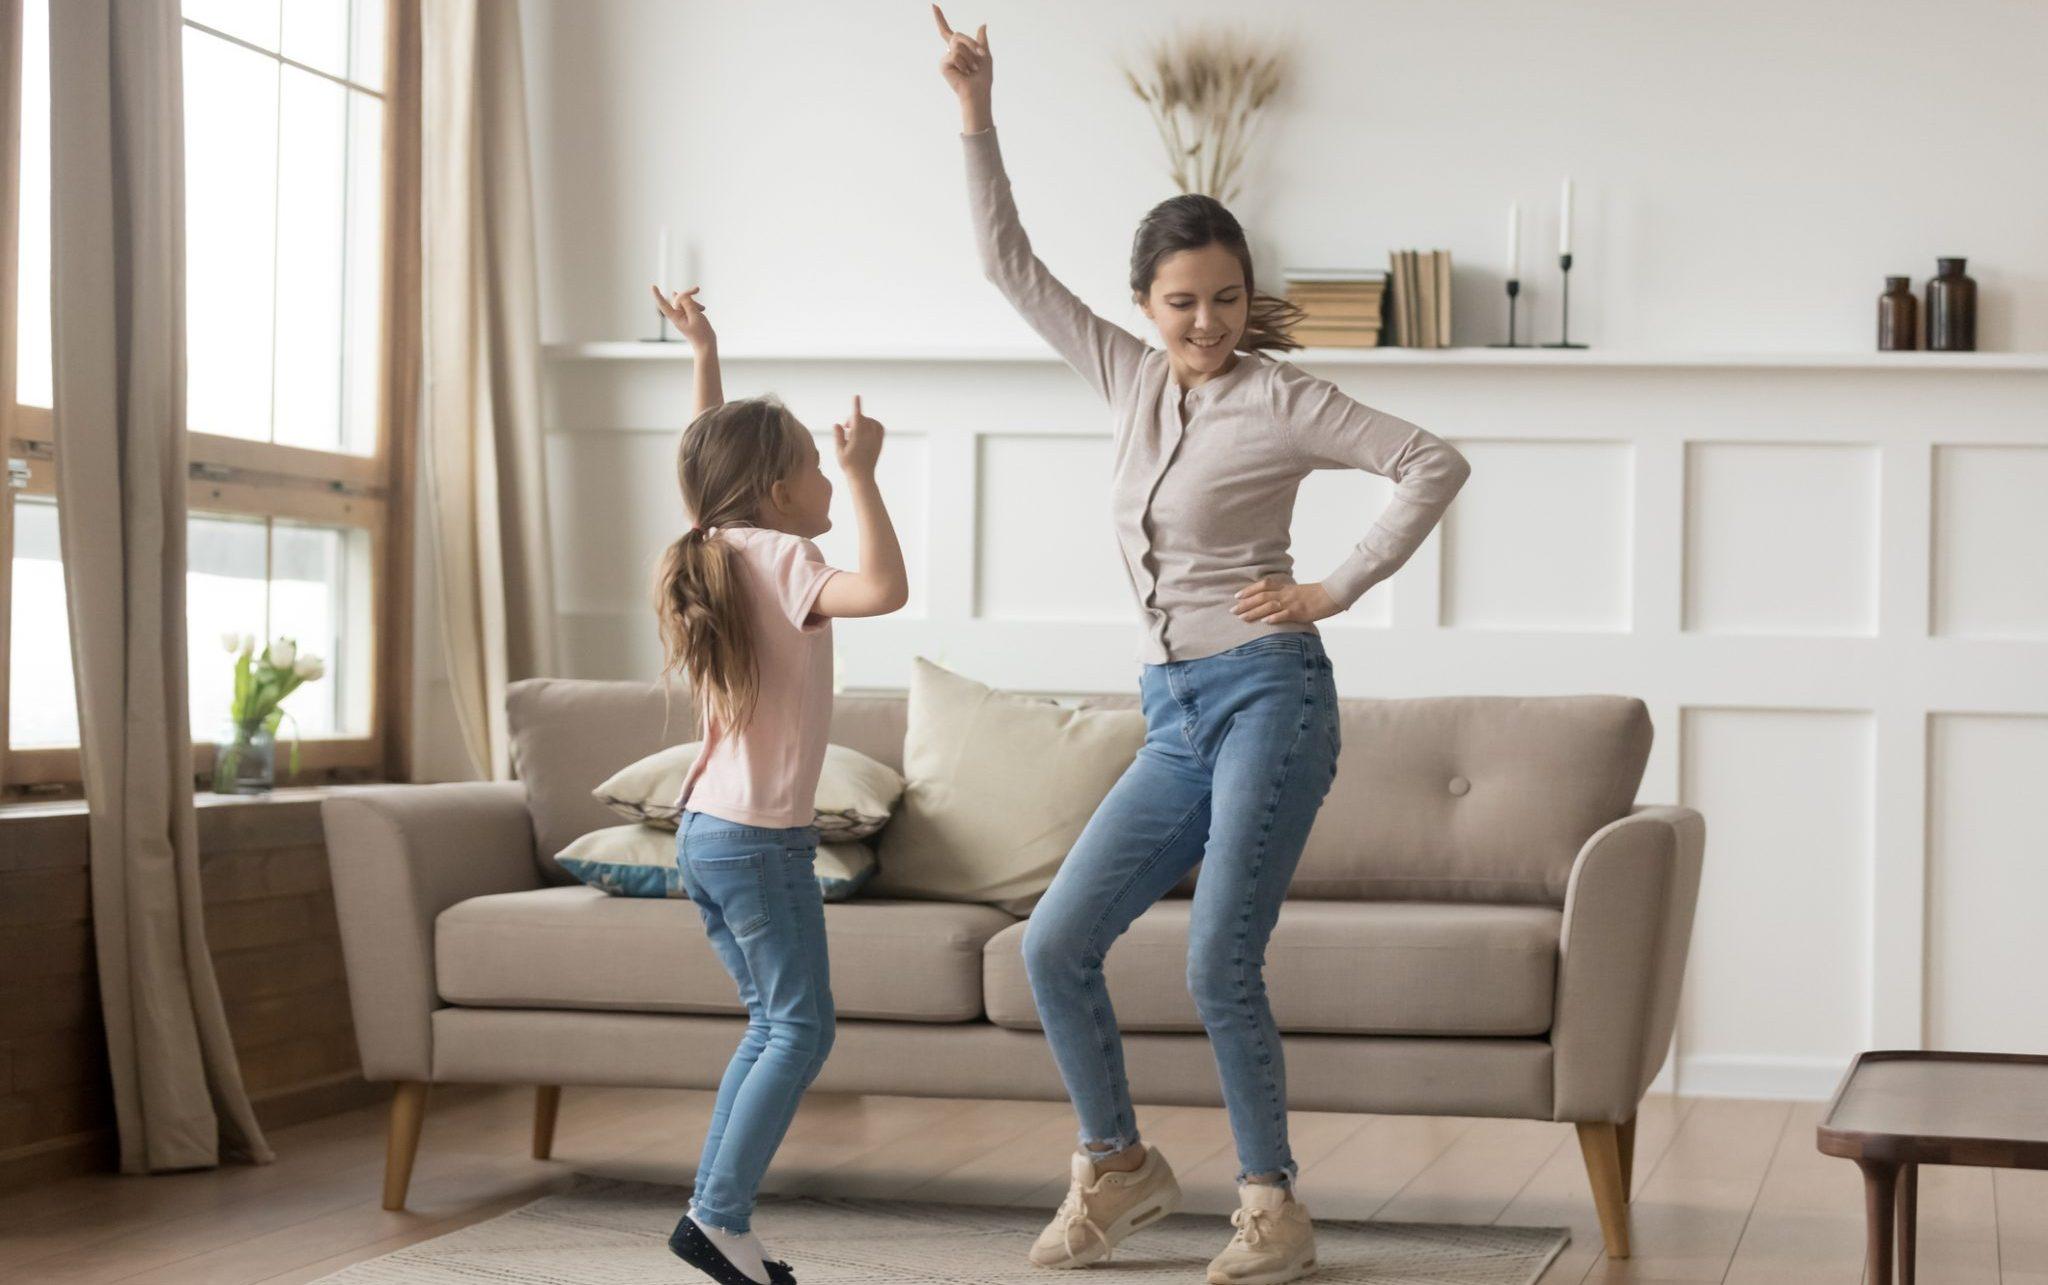 mom kid dancing